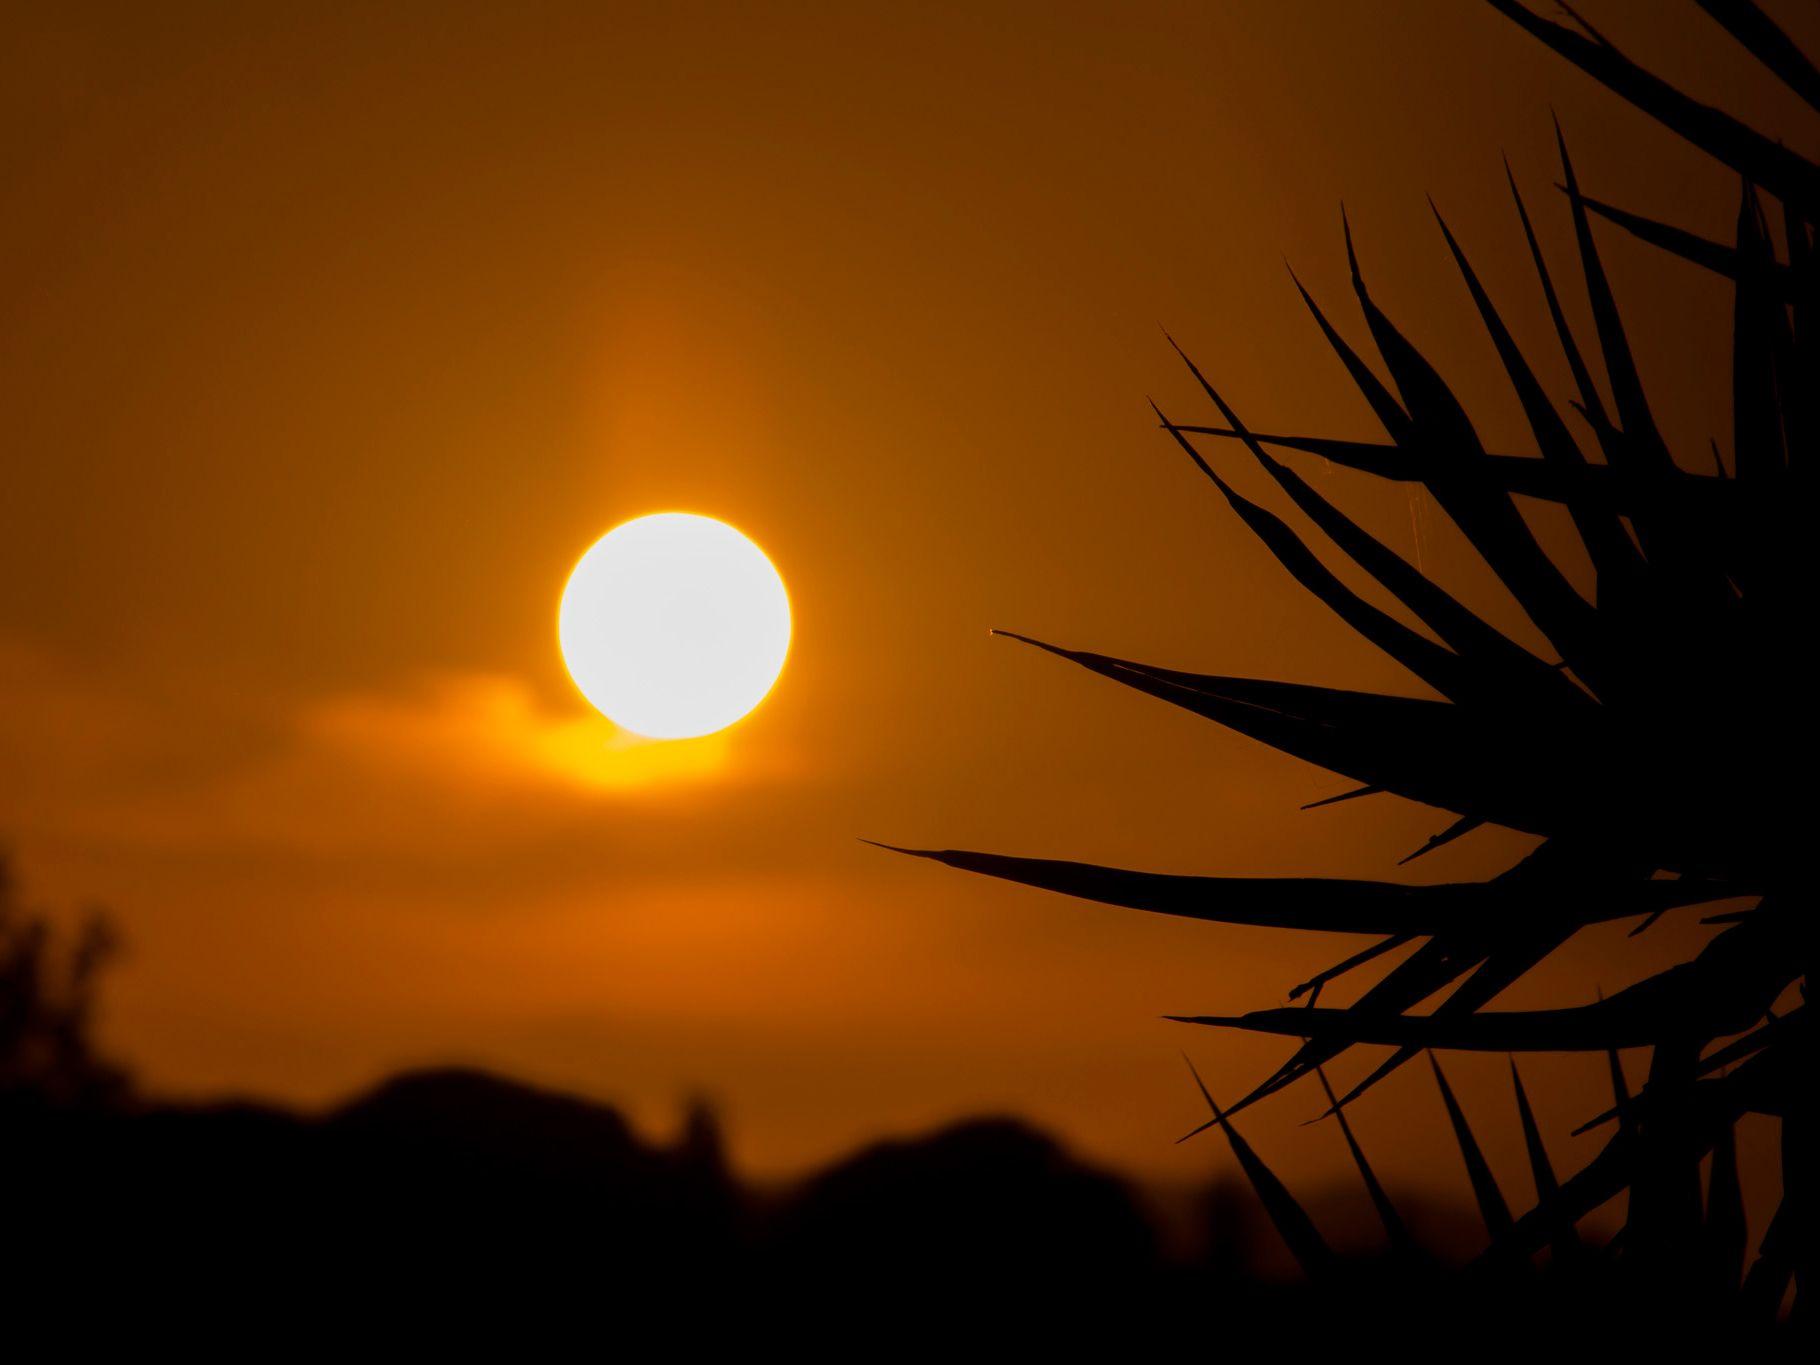 Enjoy the Sunset in Pelekas